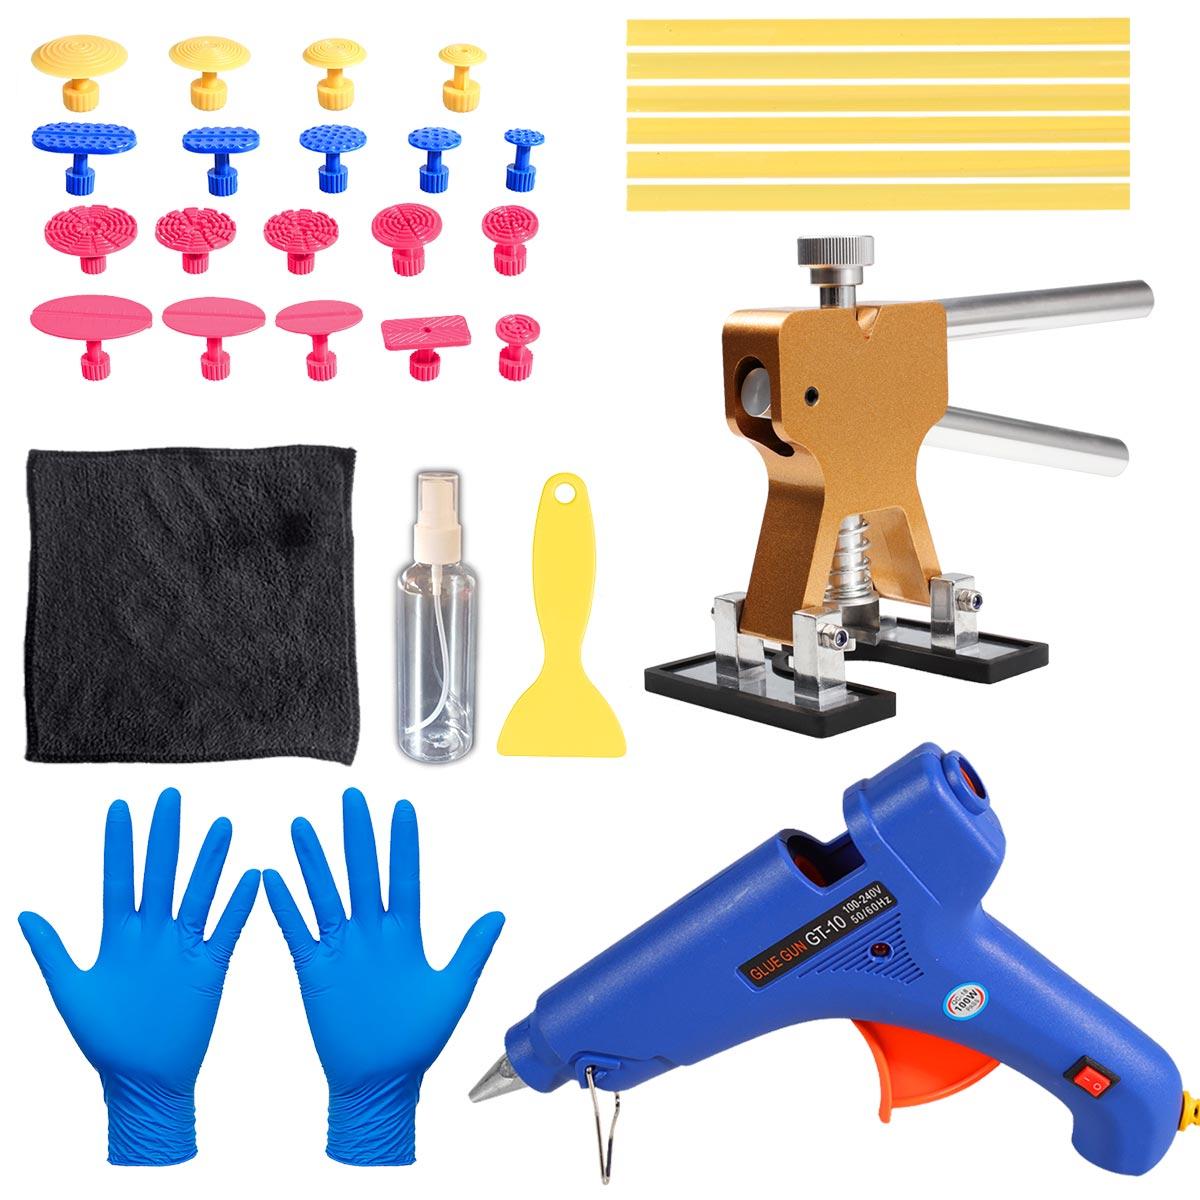 Paintless Repair Car Body Puller Tab Lifter Hail Removal Hand Tool Hot